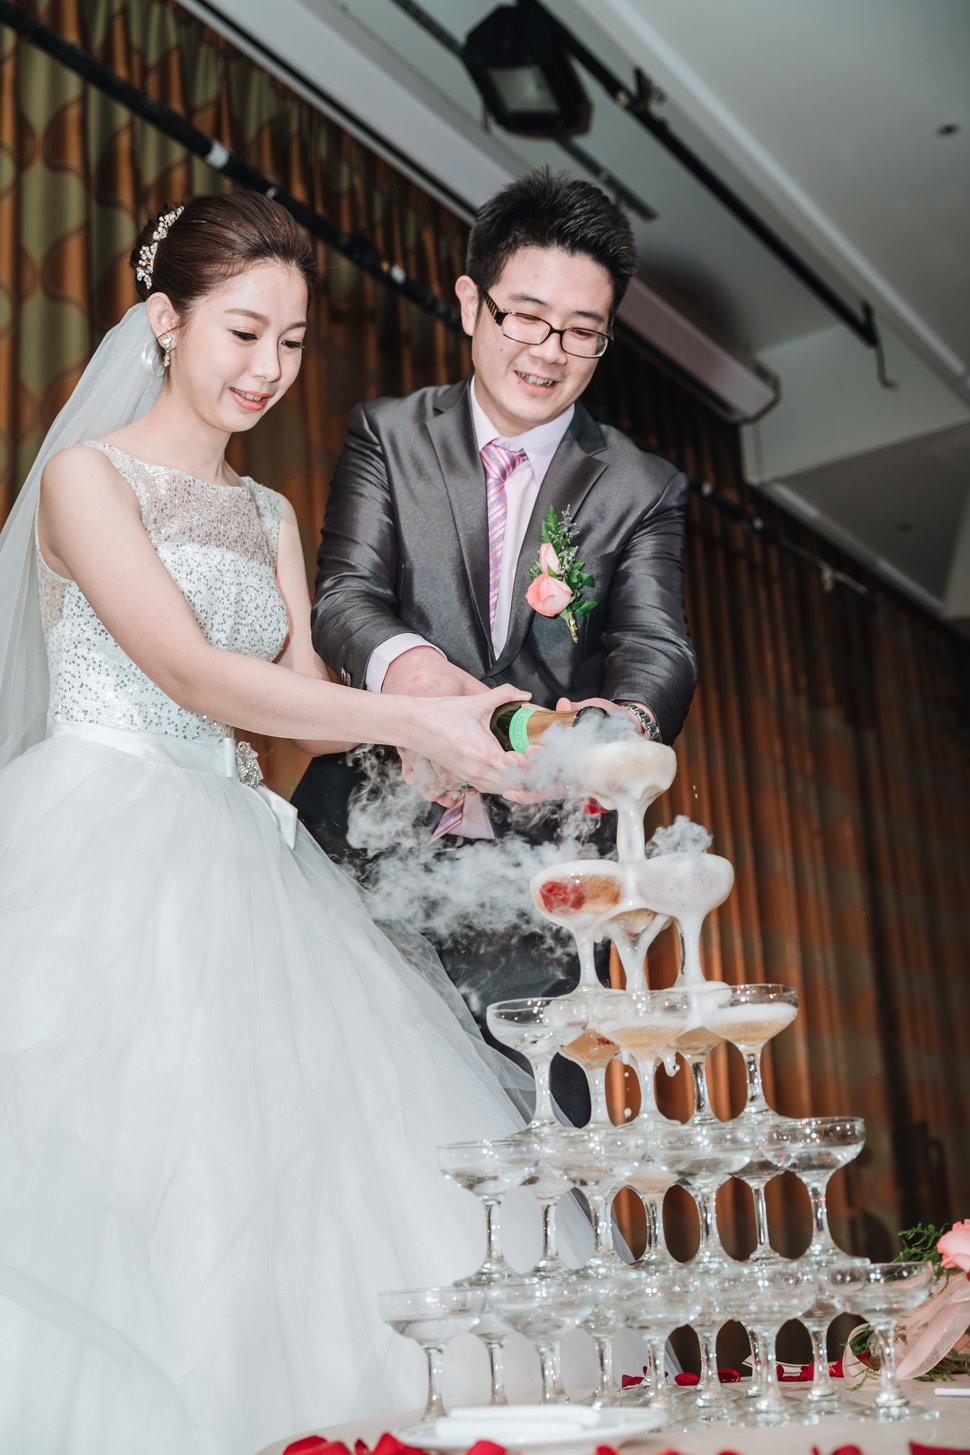 5D4_5286 - Promaker婚禮紀錄攝影團隊婚攝豪哥《結婚吧》